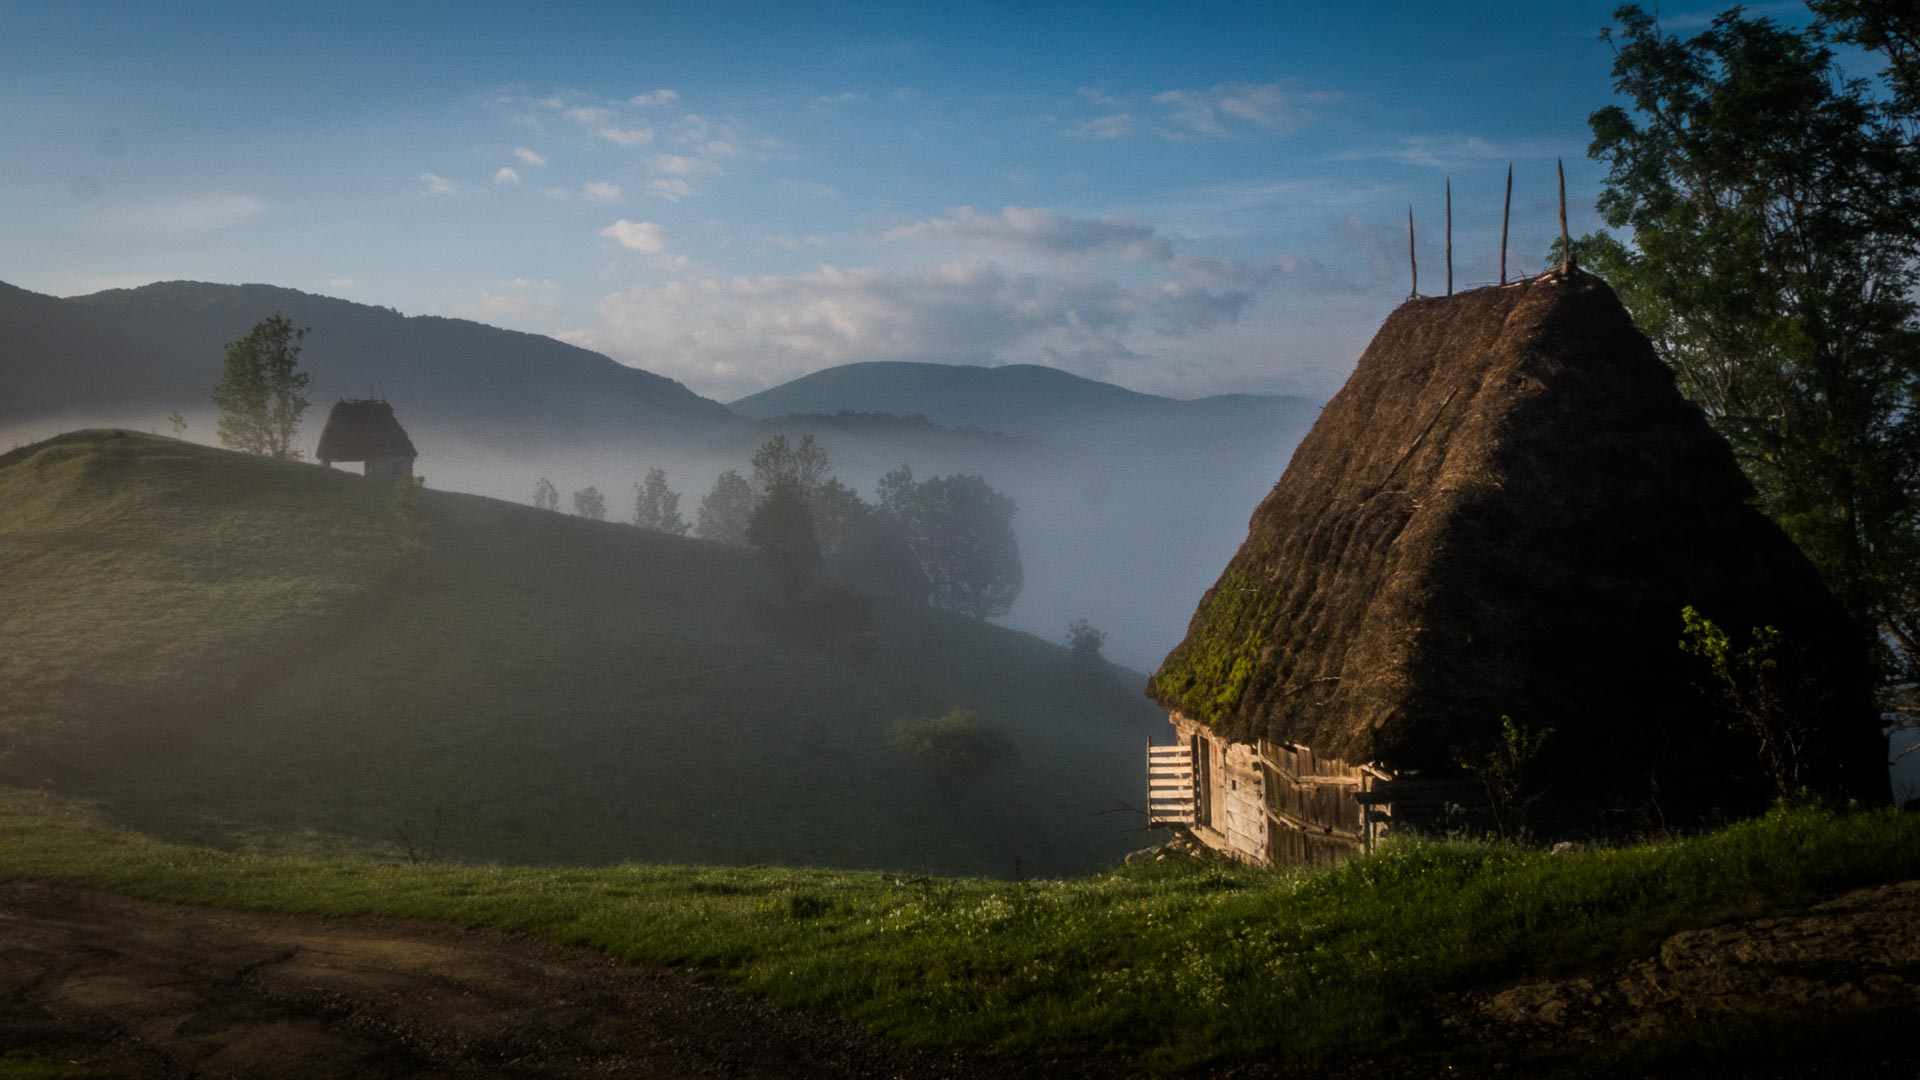 Landscape in Apuseni Mountains